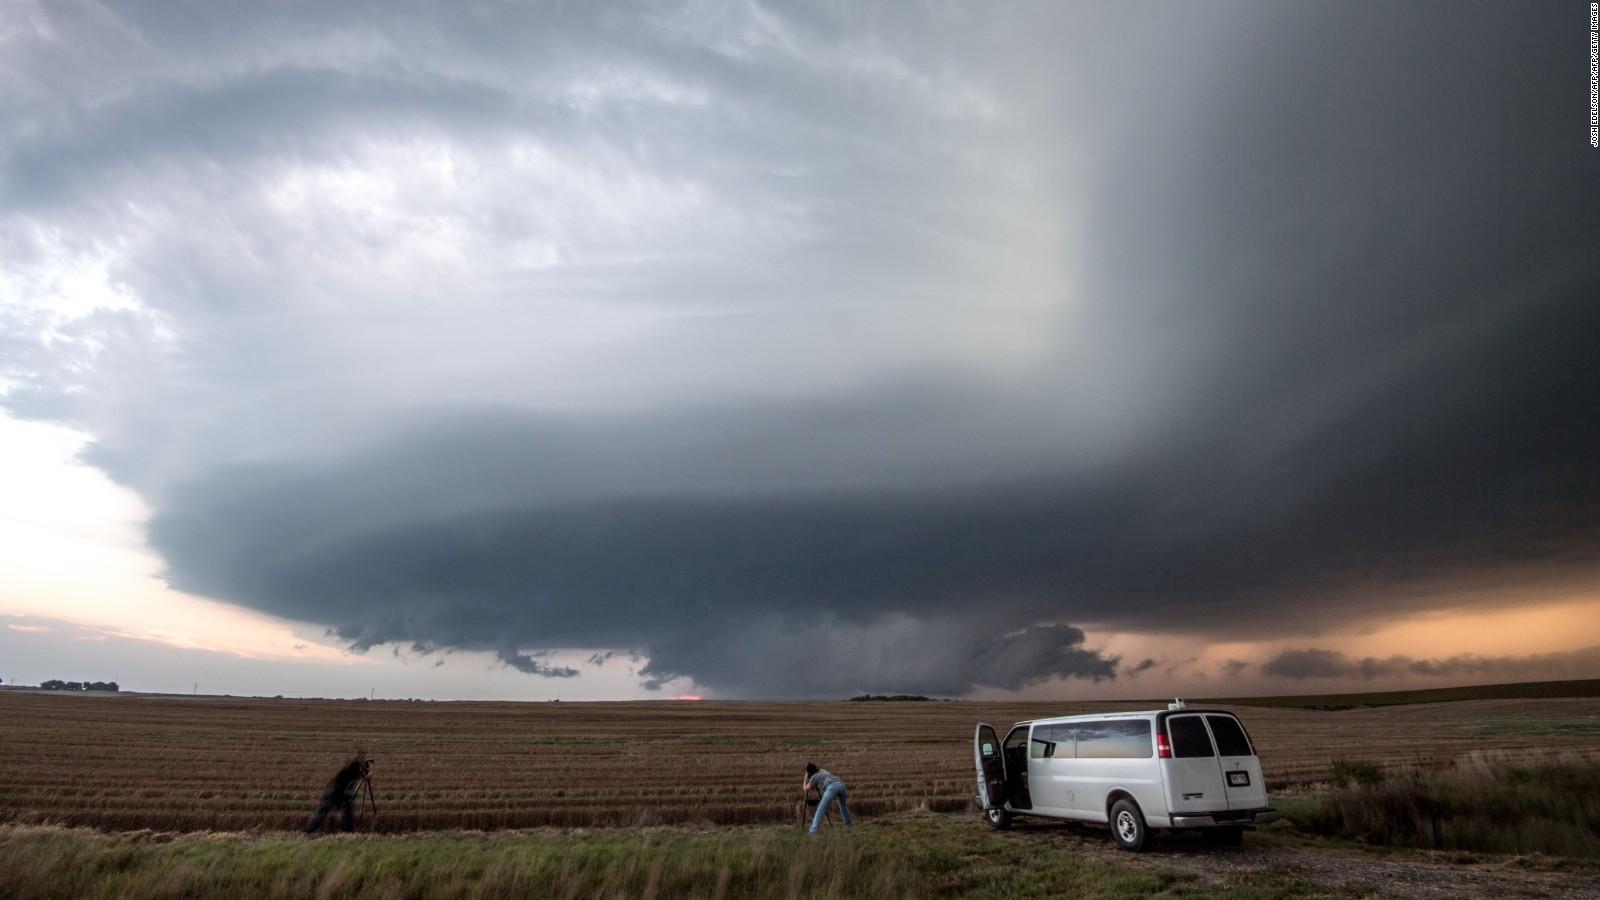 Tornado watch vs warning explained